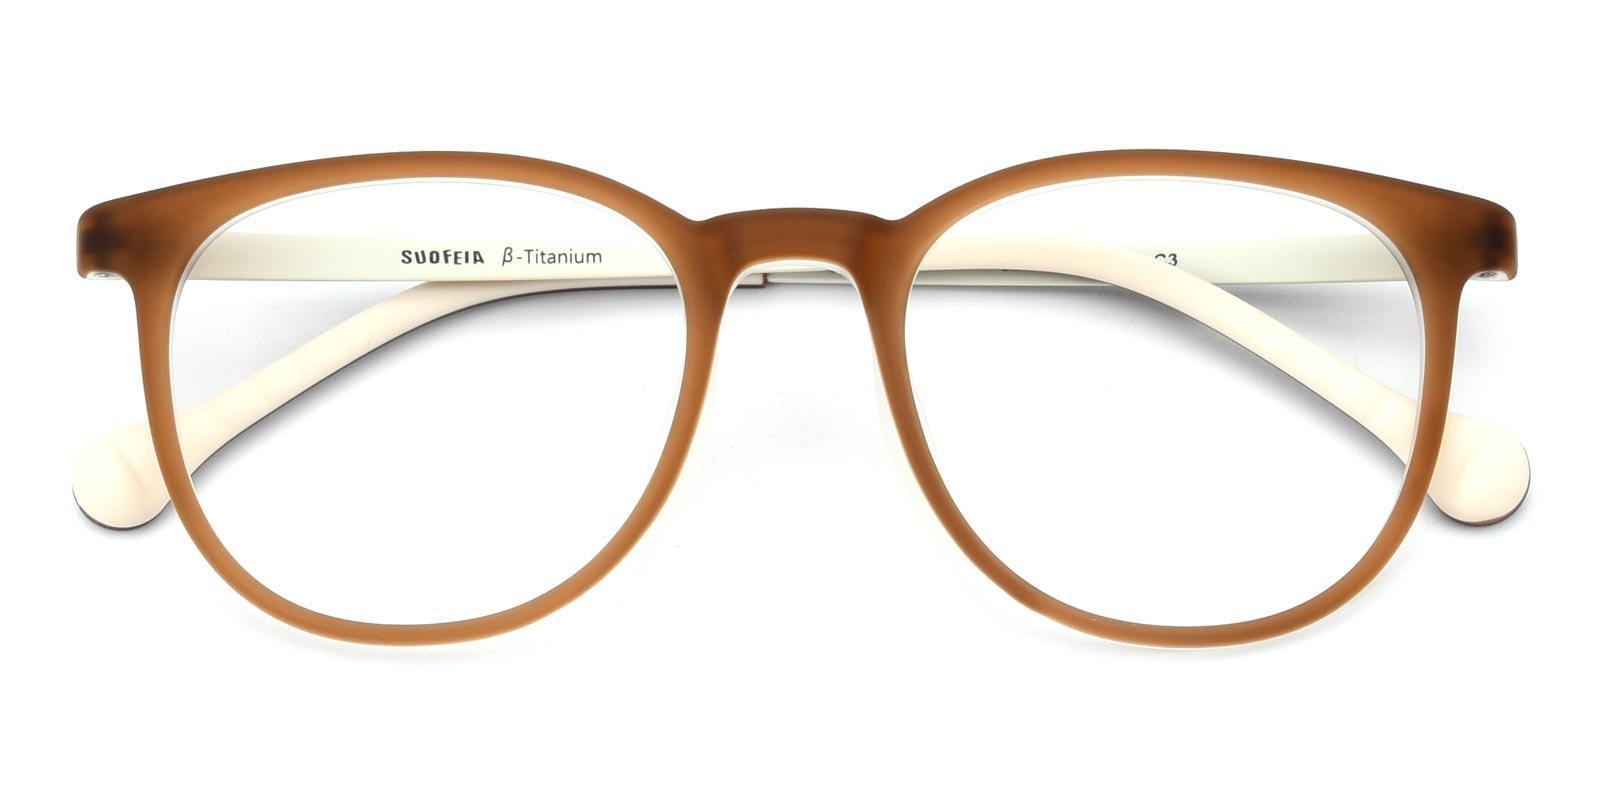 Aaron-Brown-Round-Combination-Eyeglasses-detail